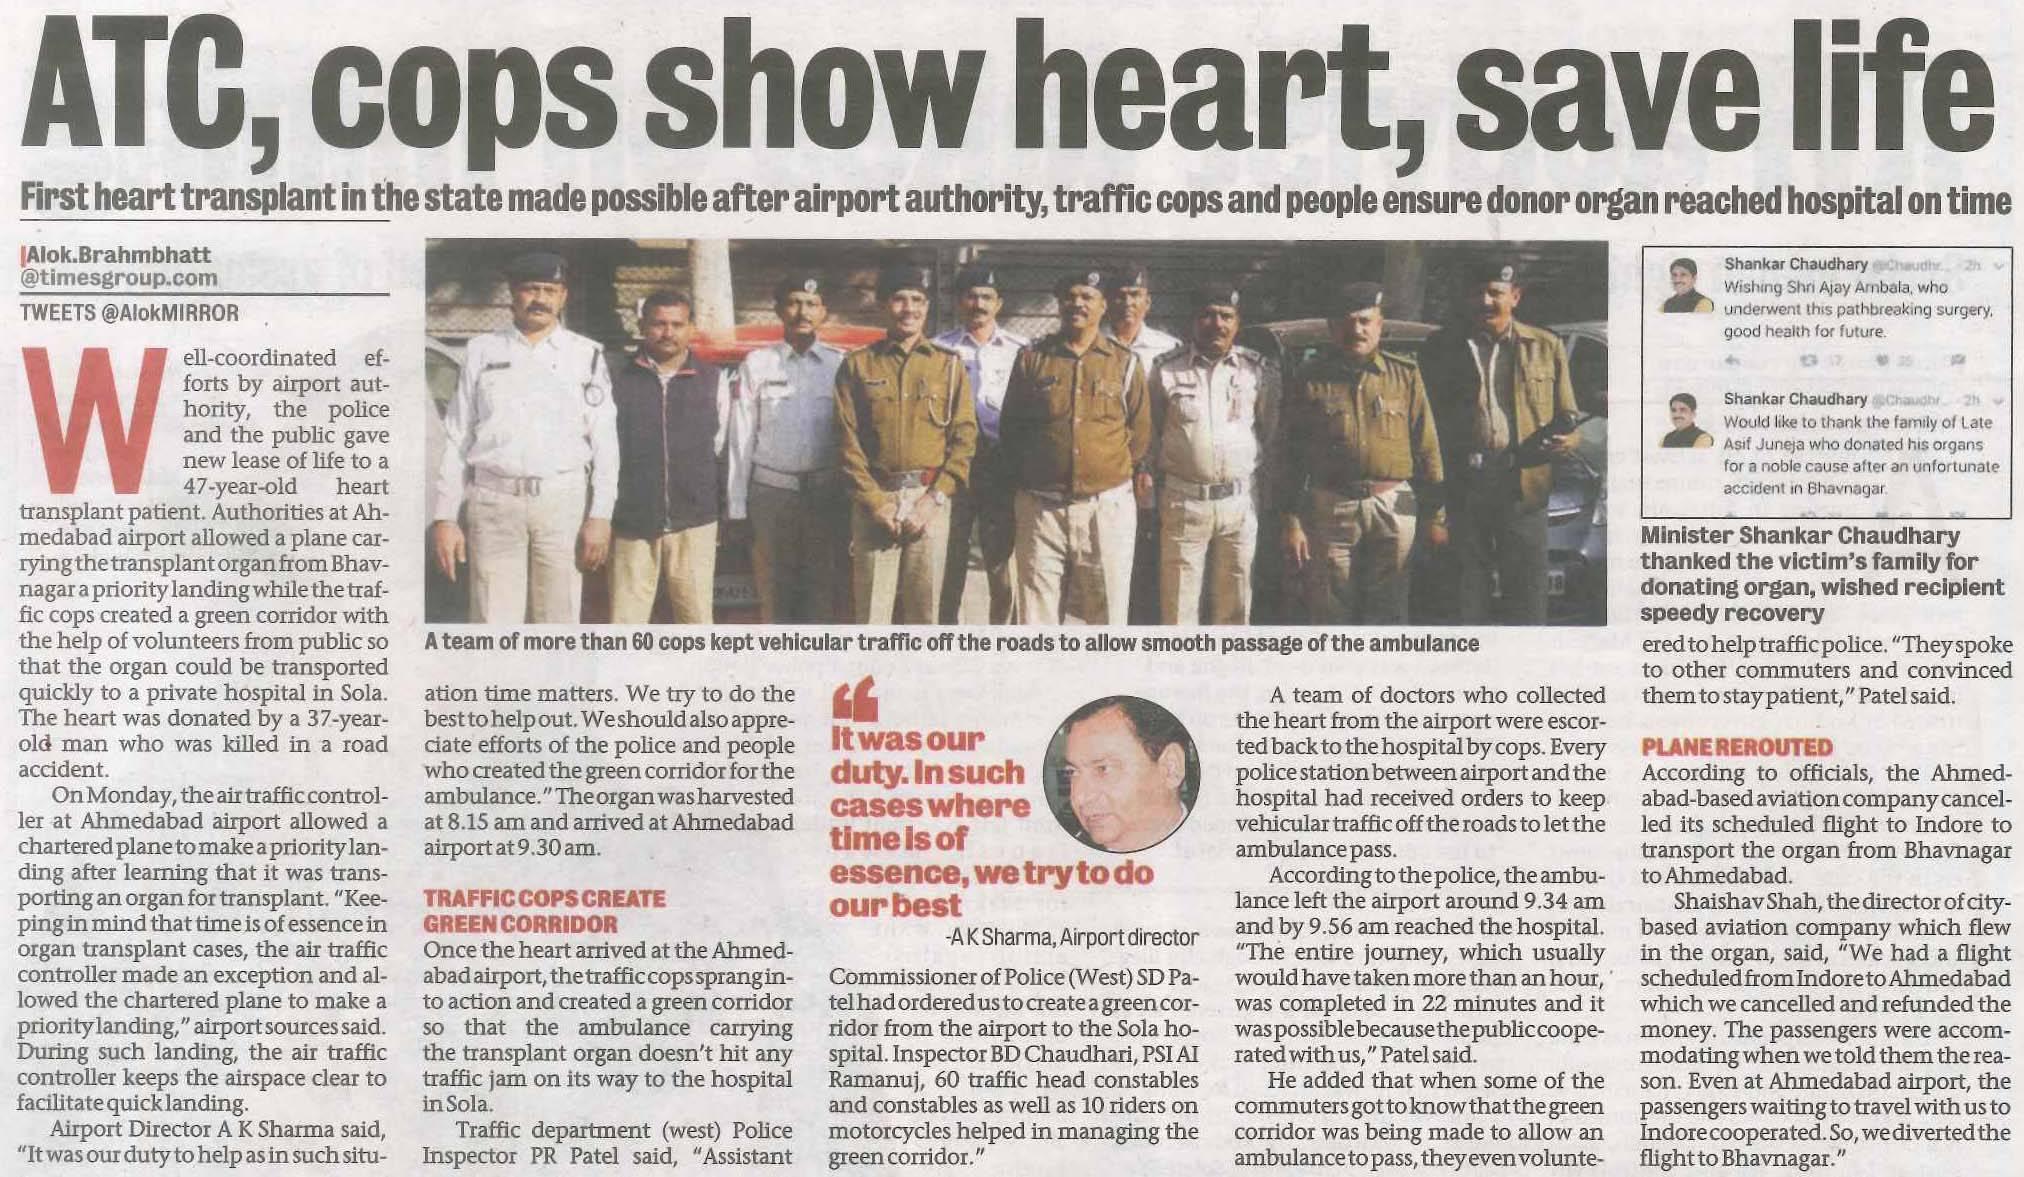 Ahmedabad Mirror (Ahd)_CIMS (1st Heart transplant in Gujarat)_20.12.16_Pg 03 (2)